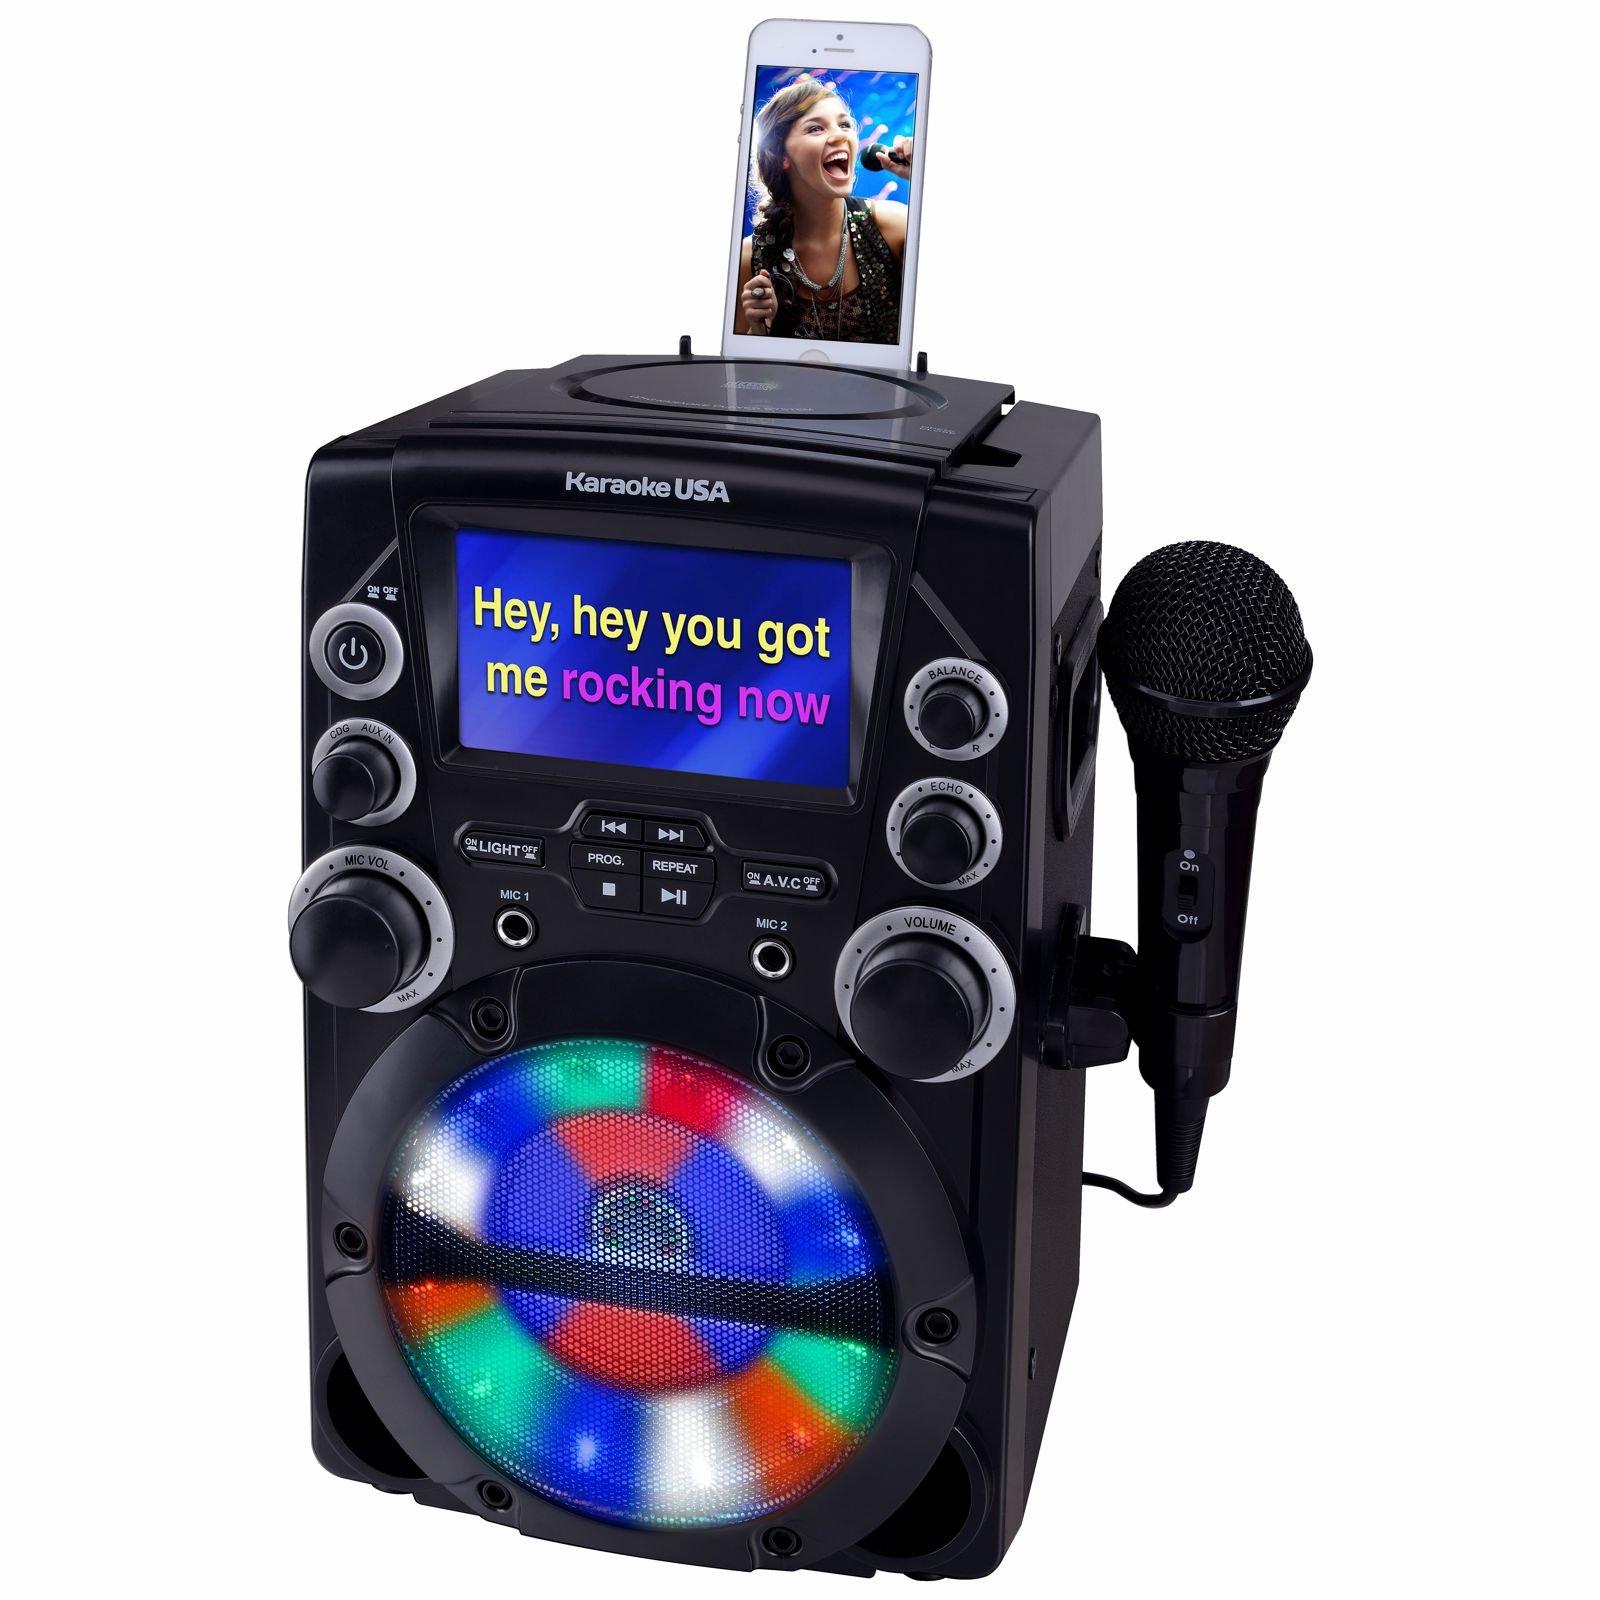 Karaoke USA GQ740 CD+G Karaoke System with 4.3'' Color TFT Screen